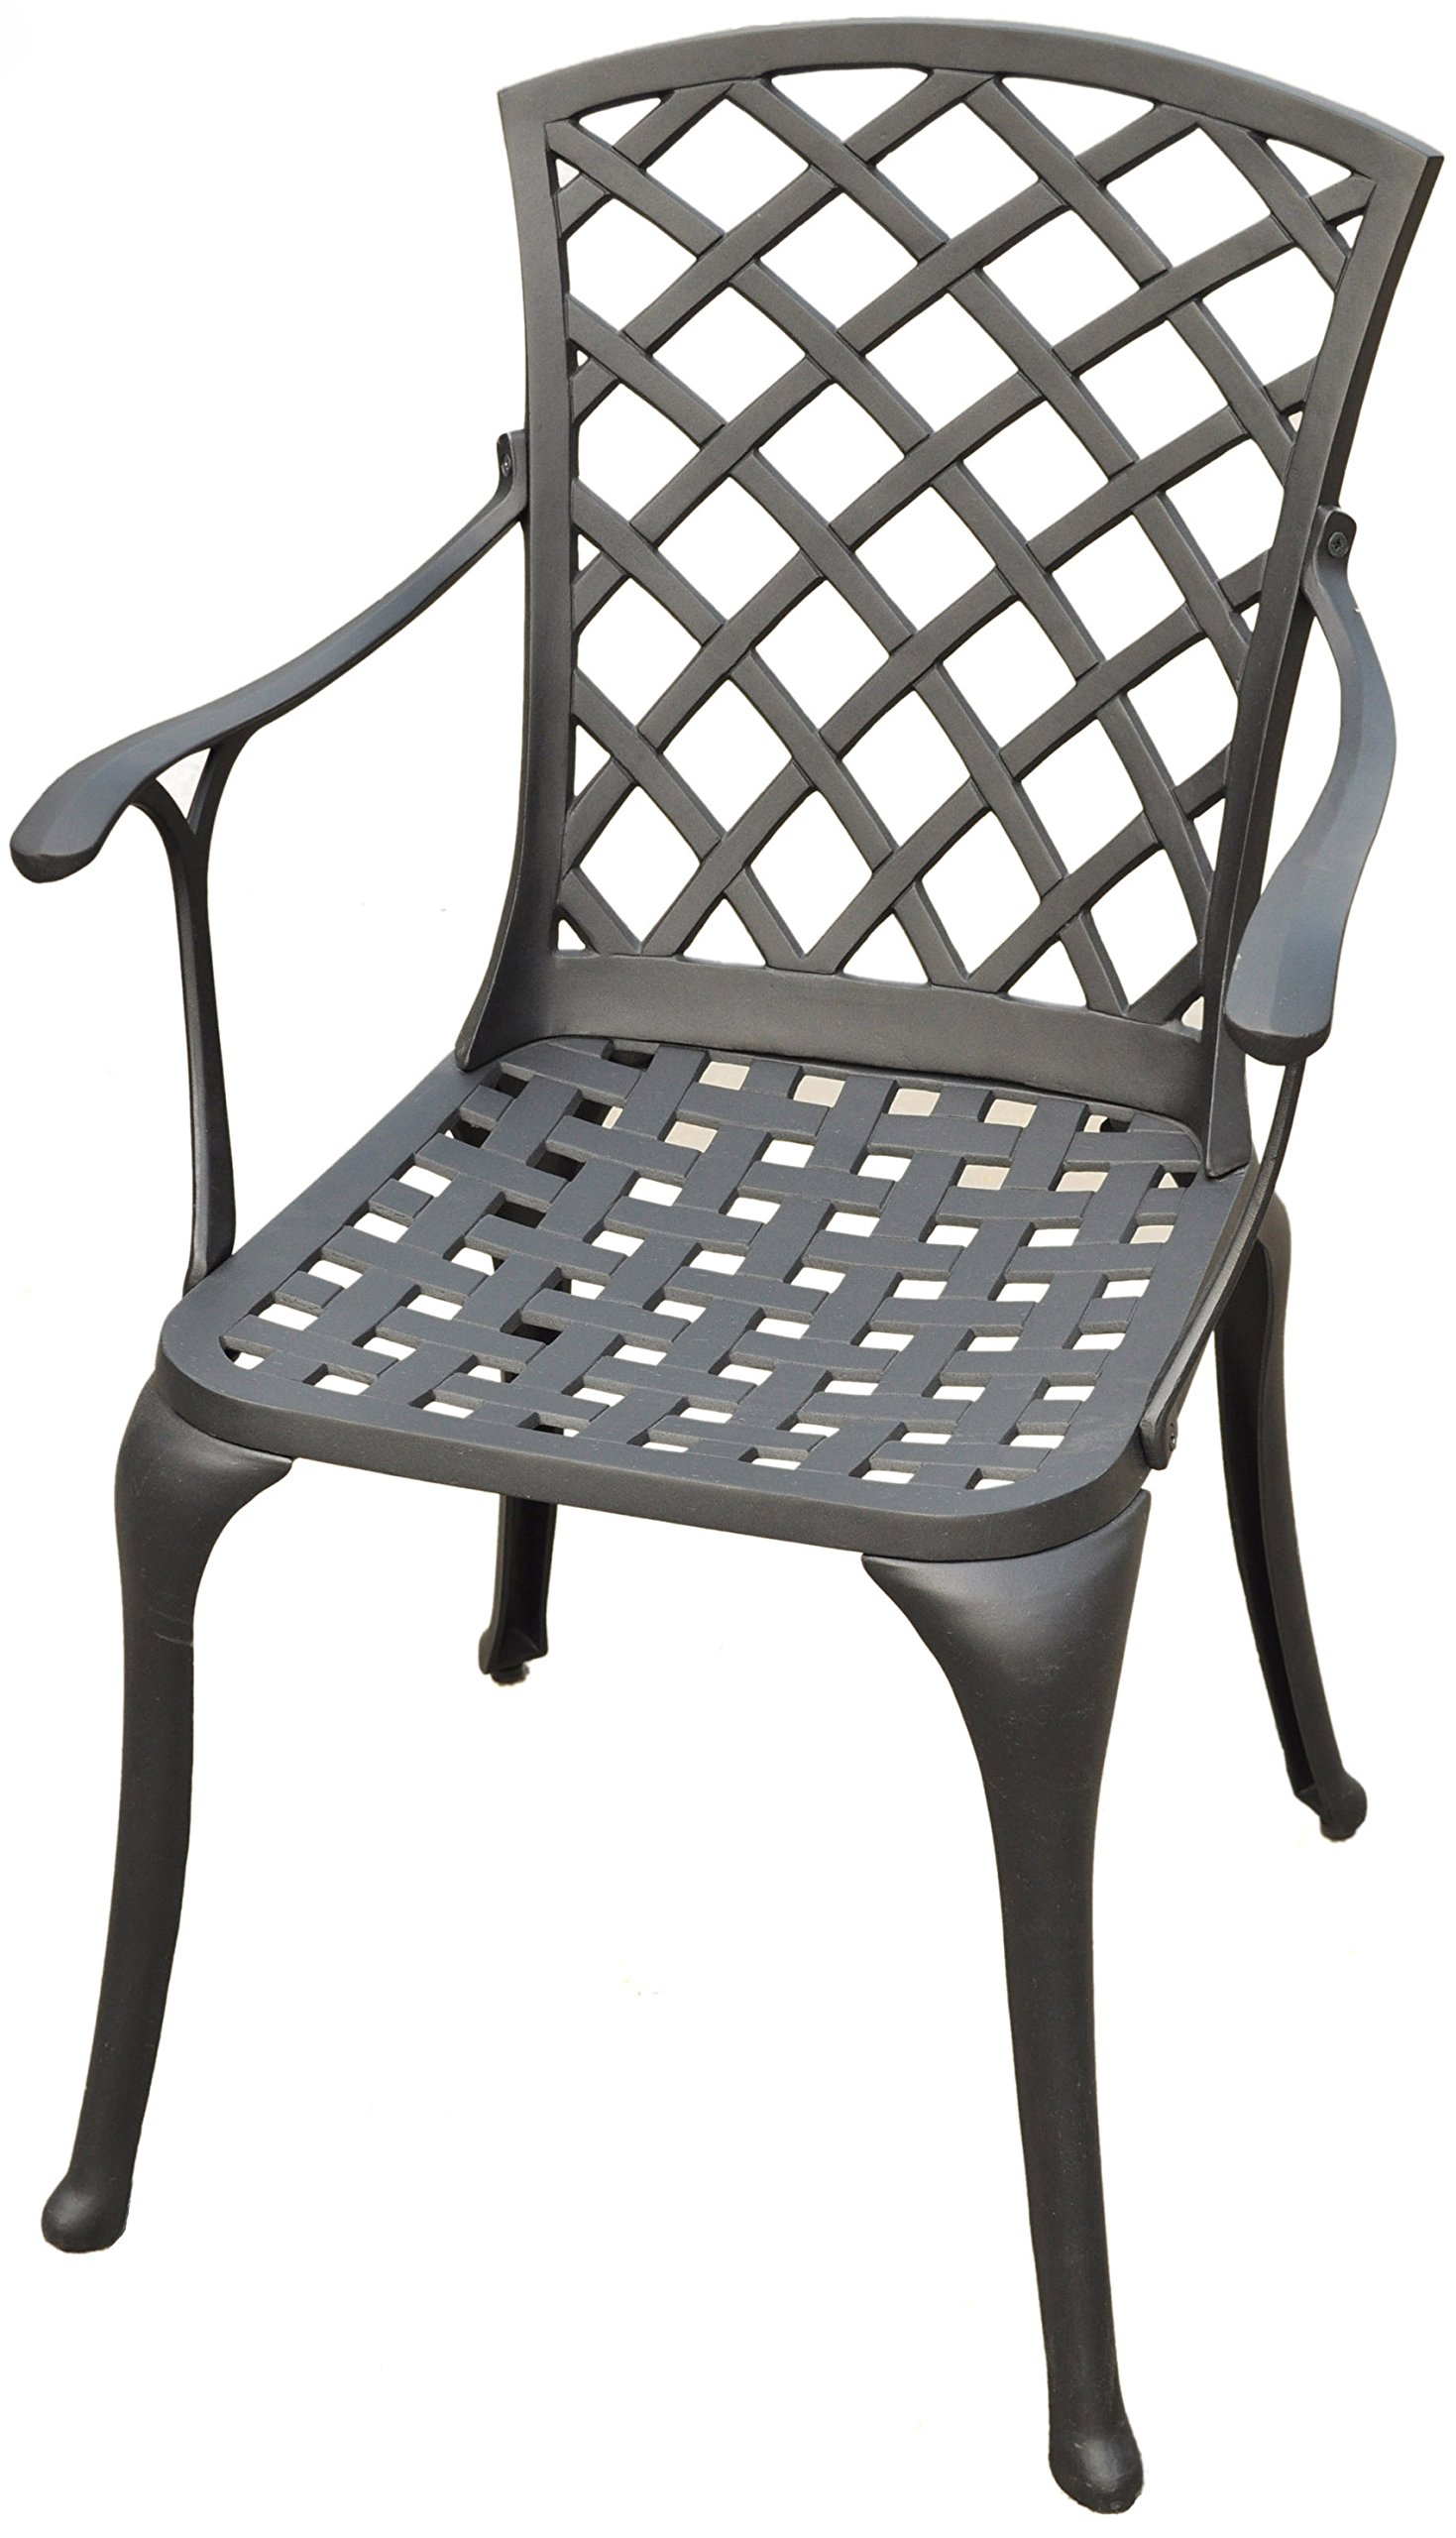 Crosley Furniture Sedona Solid-Cast Aluminum Outdoor High-Back Arm Chair - Black (Set of 2)